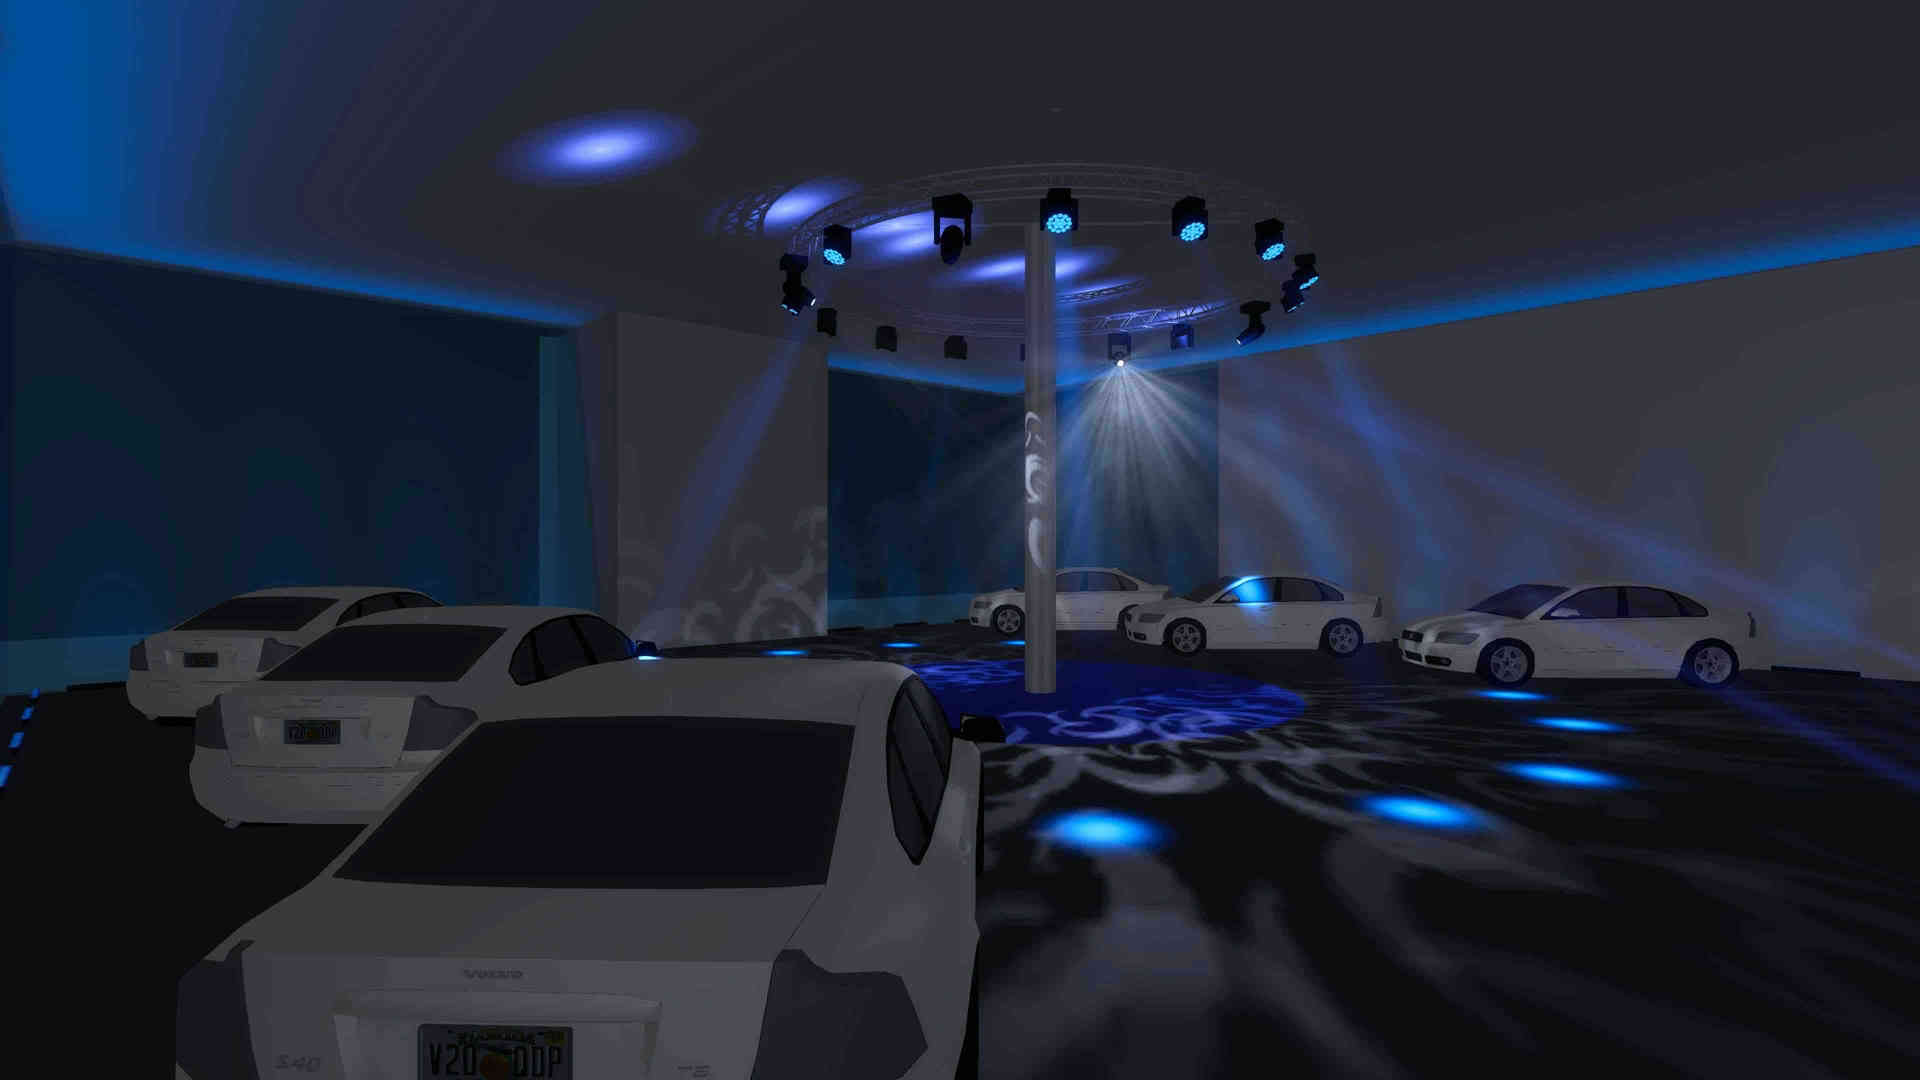 CarProductionSetupLightingStage 05.jpg